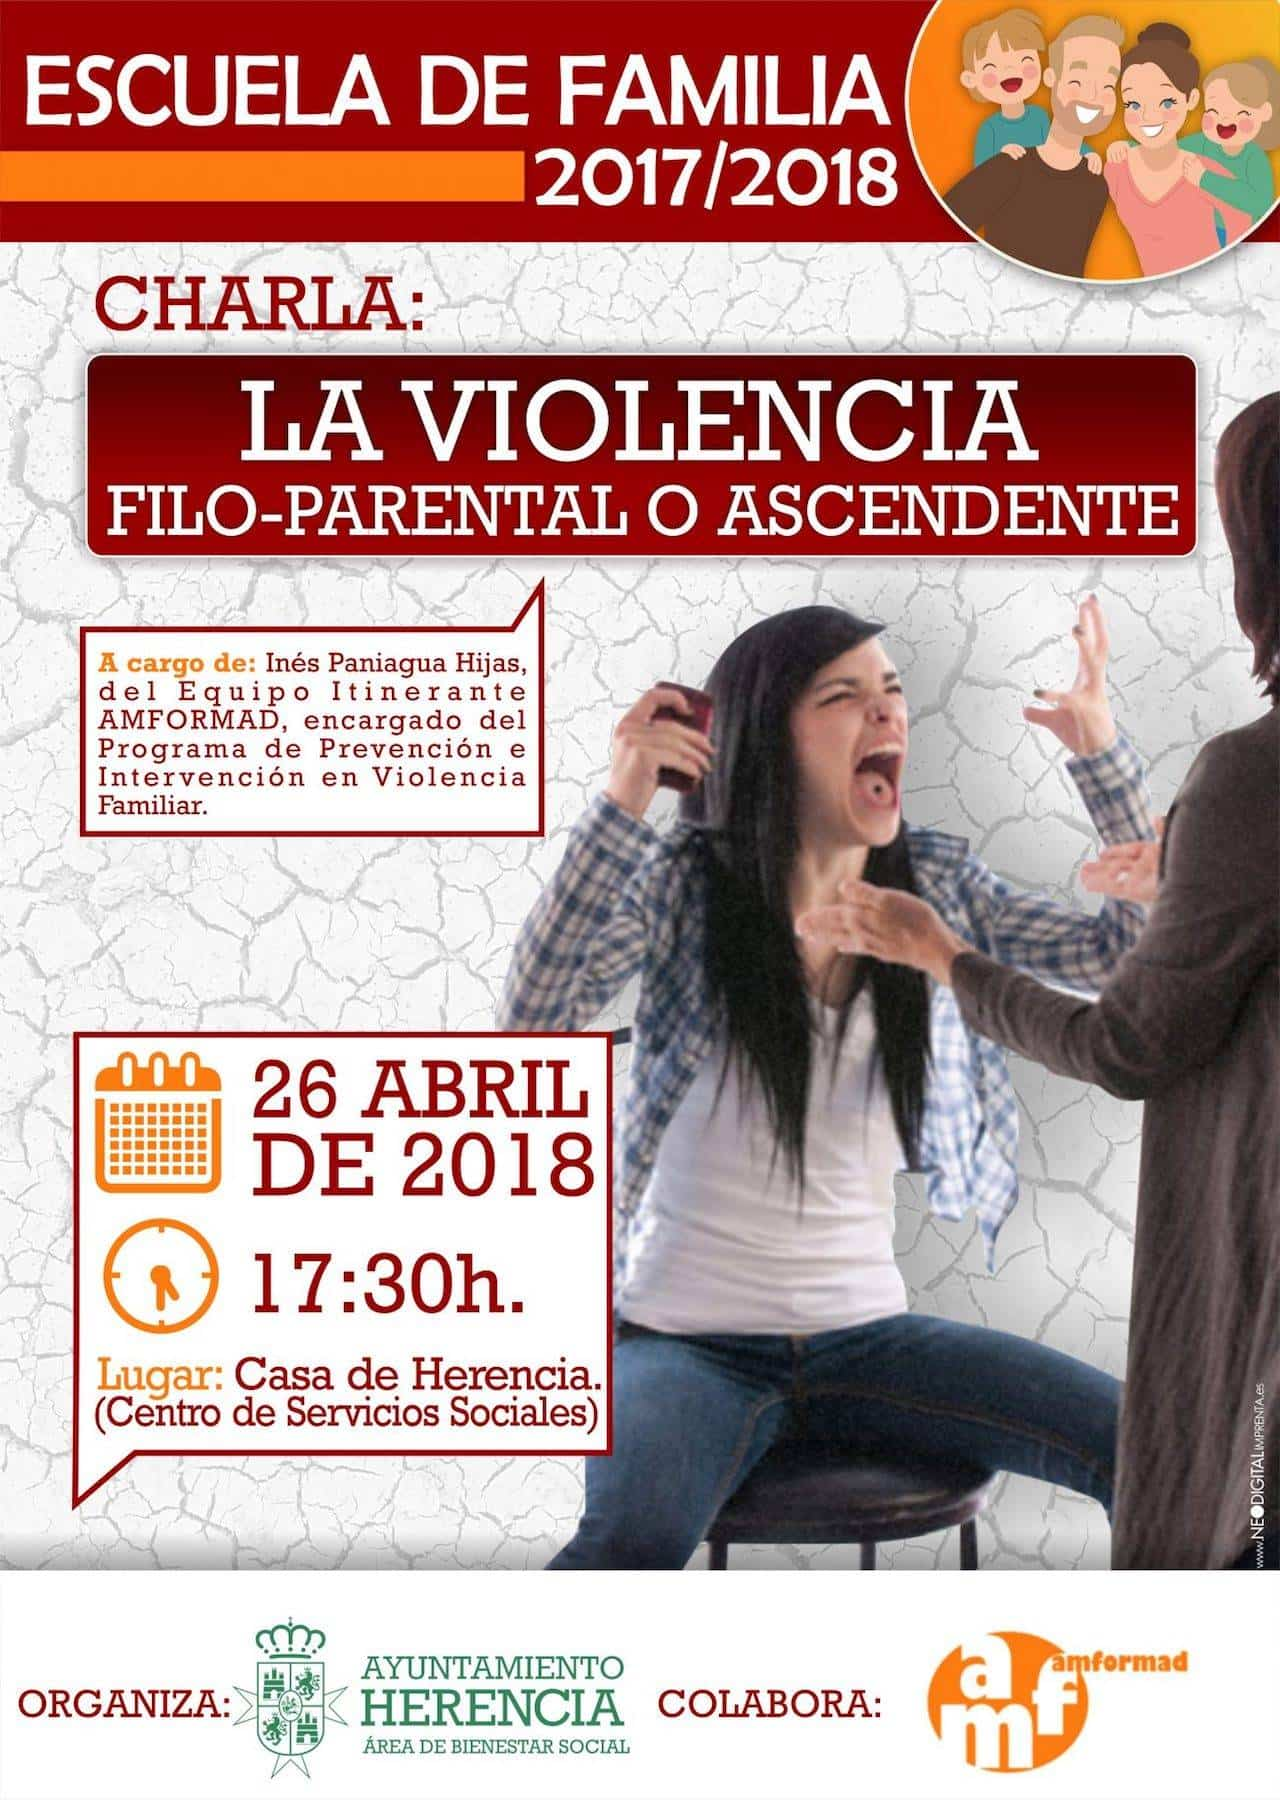 escuela familia violencia familiar - La Escuela de Familia finaliza su temporada 2017/2018